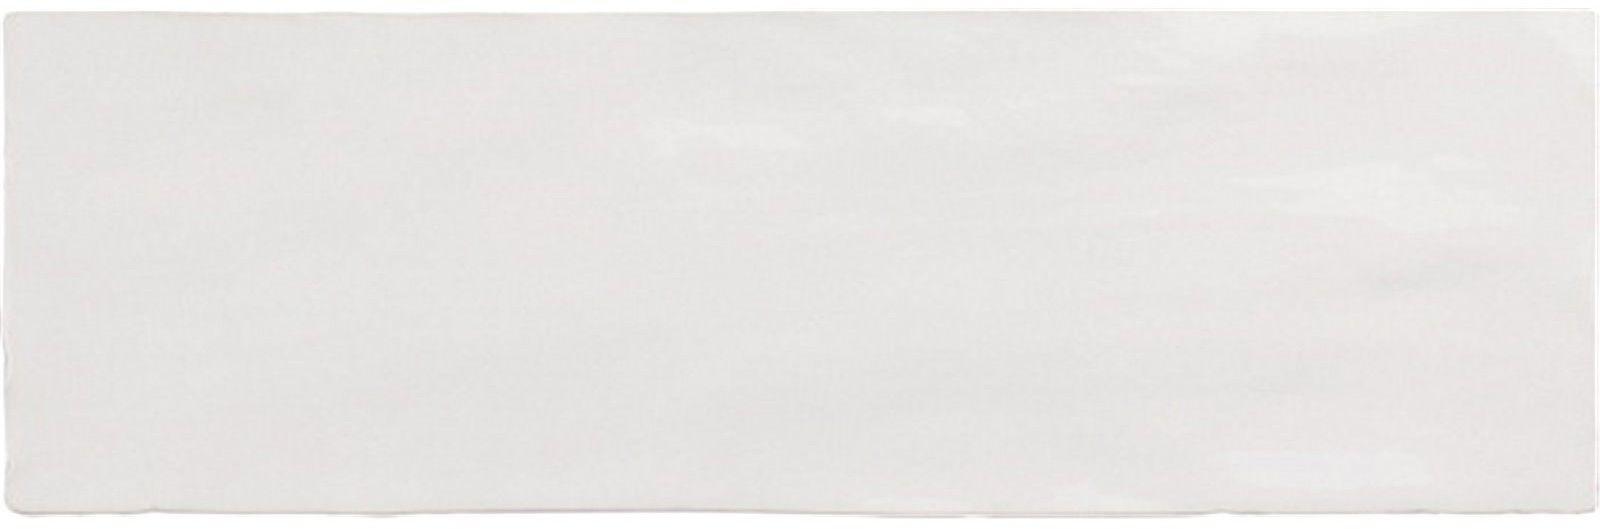 La Riviera Blanc 6,5 x 20 płytki prostokąt